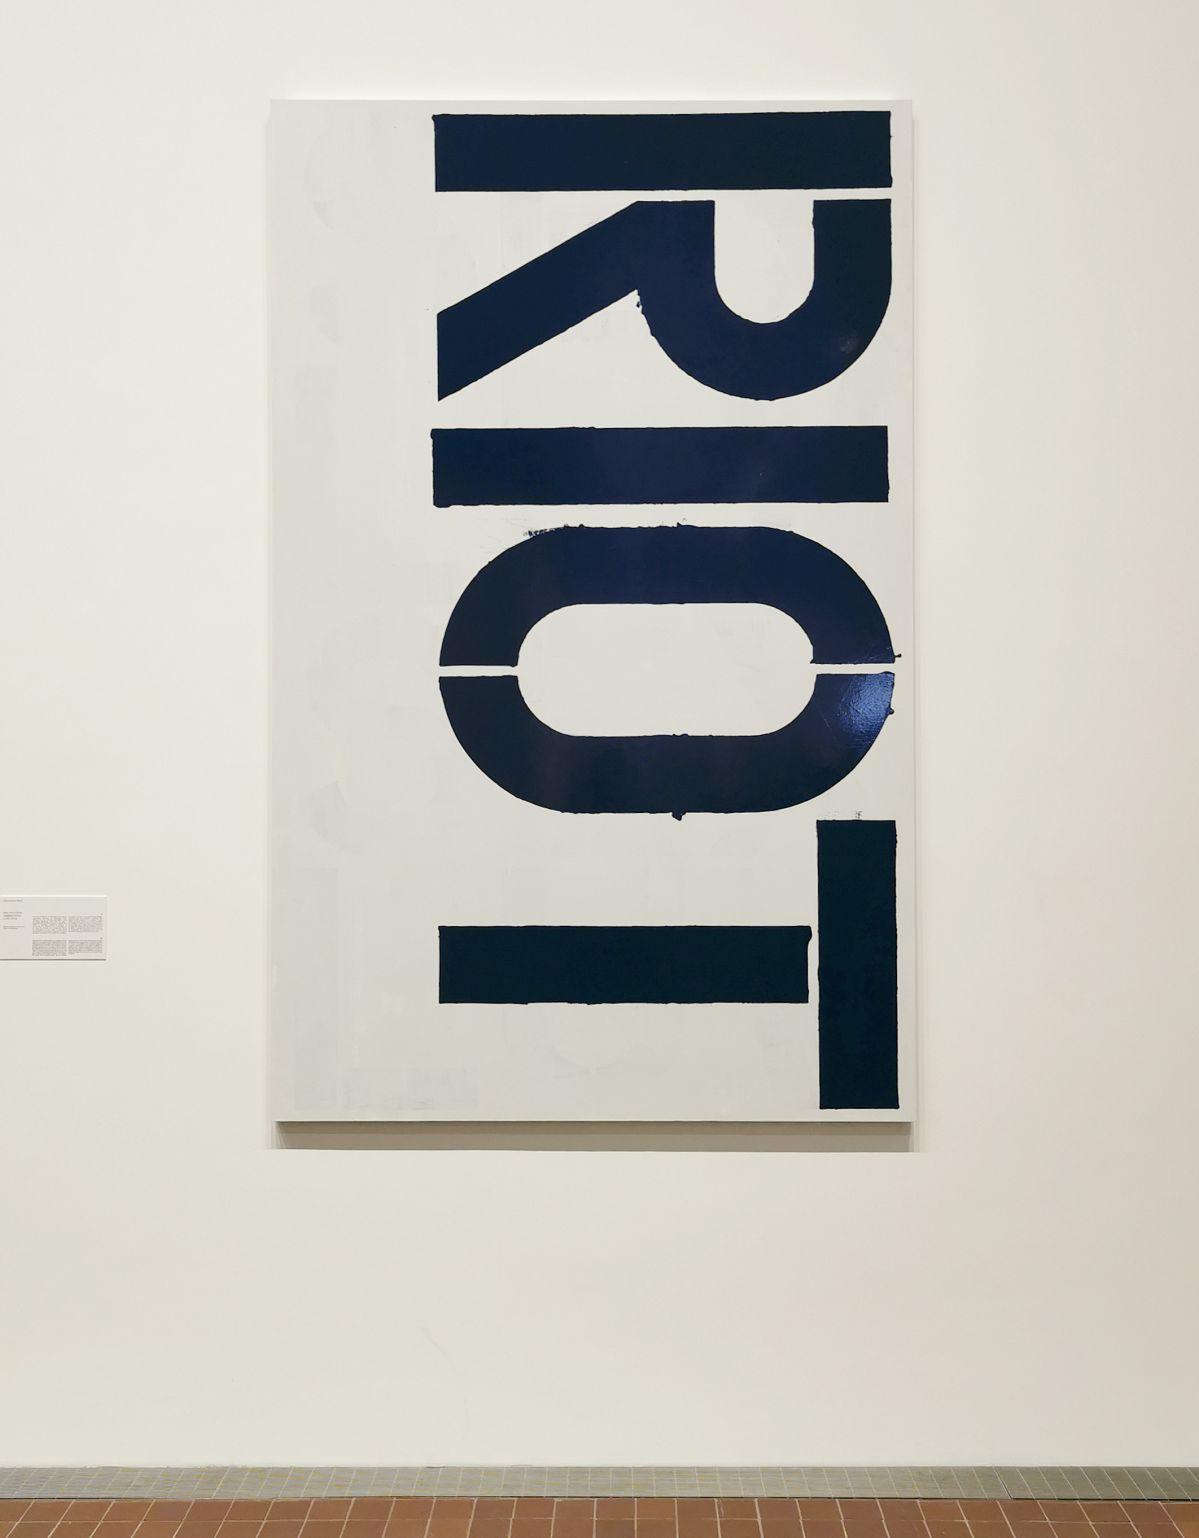 Christopher Wool - Sans titre (P135), 1989-1990 - The Impermanent Display , Collection Maja Hoffmann - Luma Arles 2021